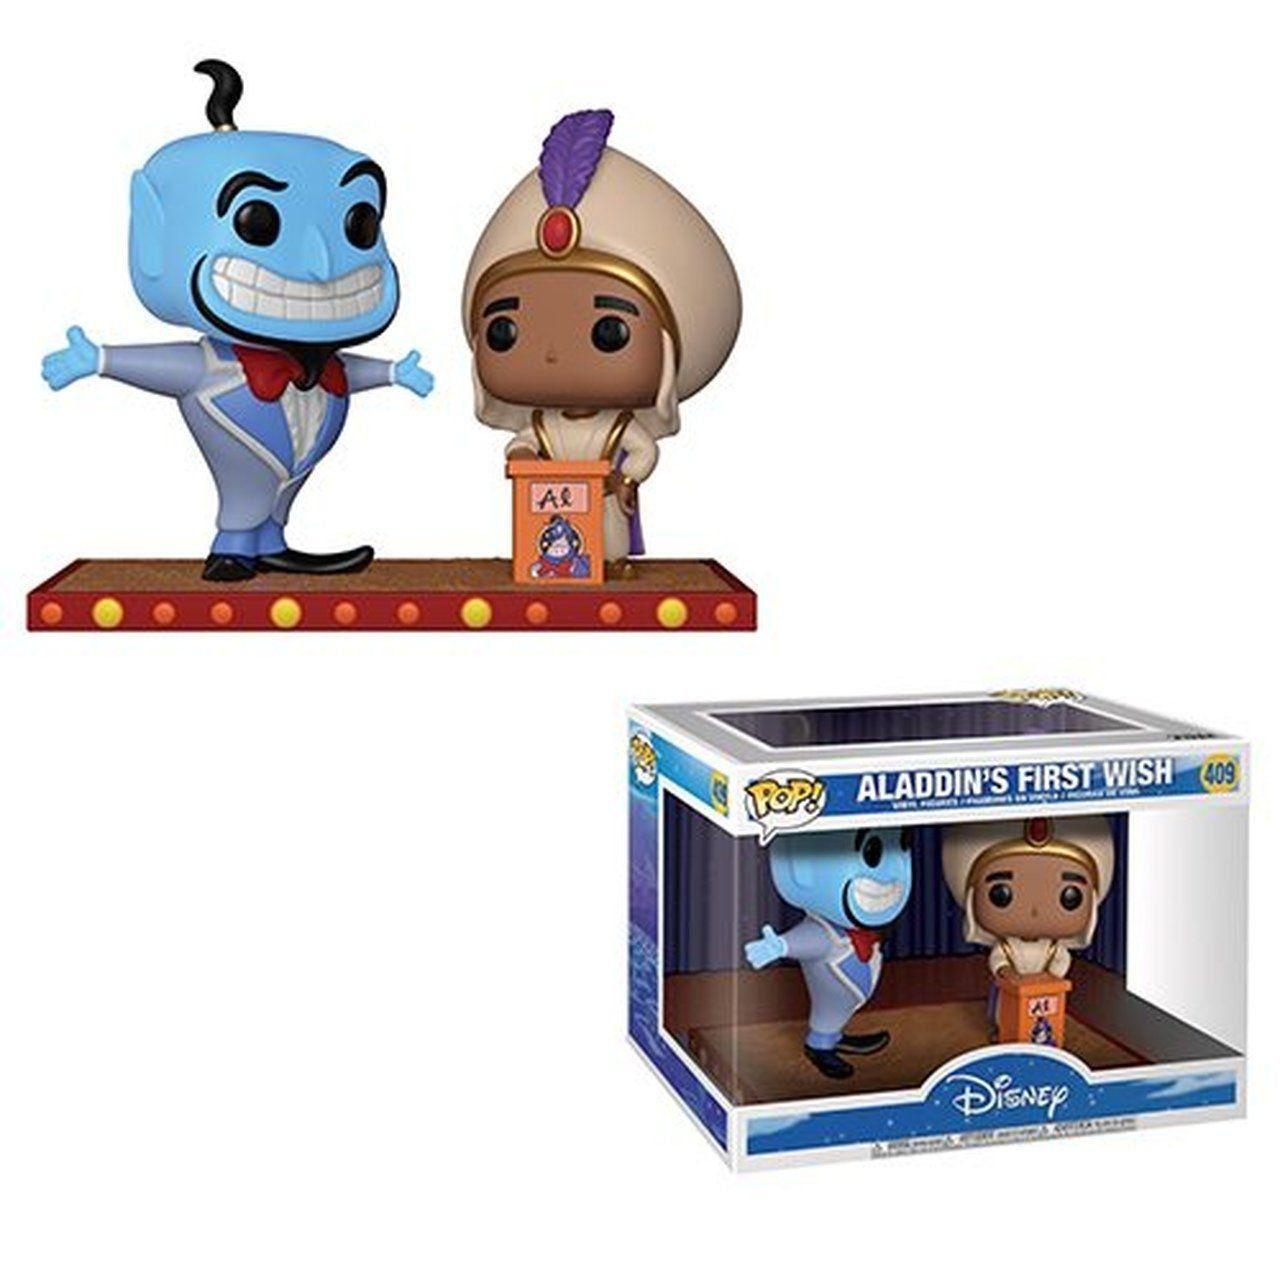 Funko Pop! Aladdin Genie First Wish 2 Pack: Aladdin´s Disney #409 - Funko